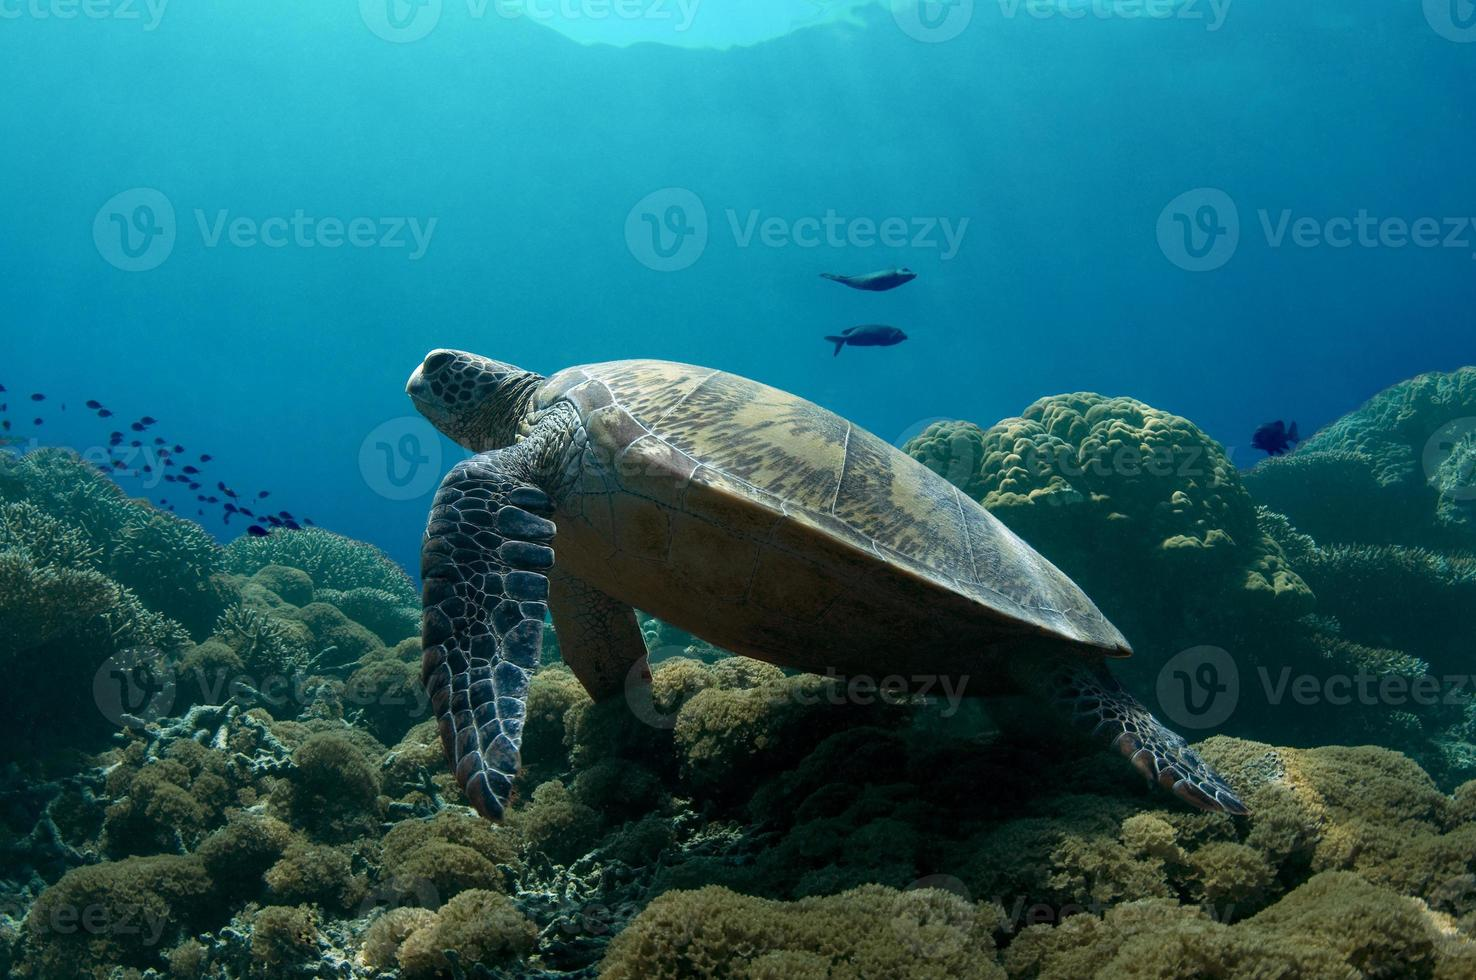 tartaruga verde a riposo foto